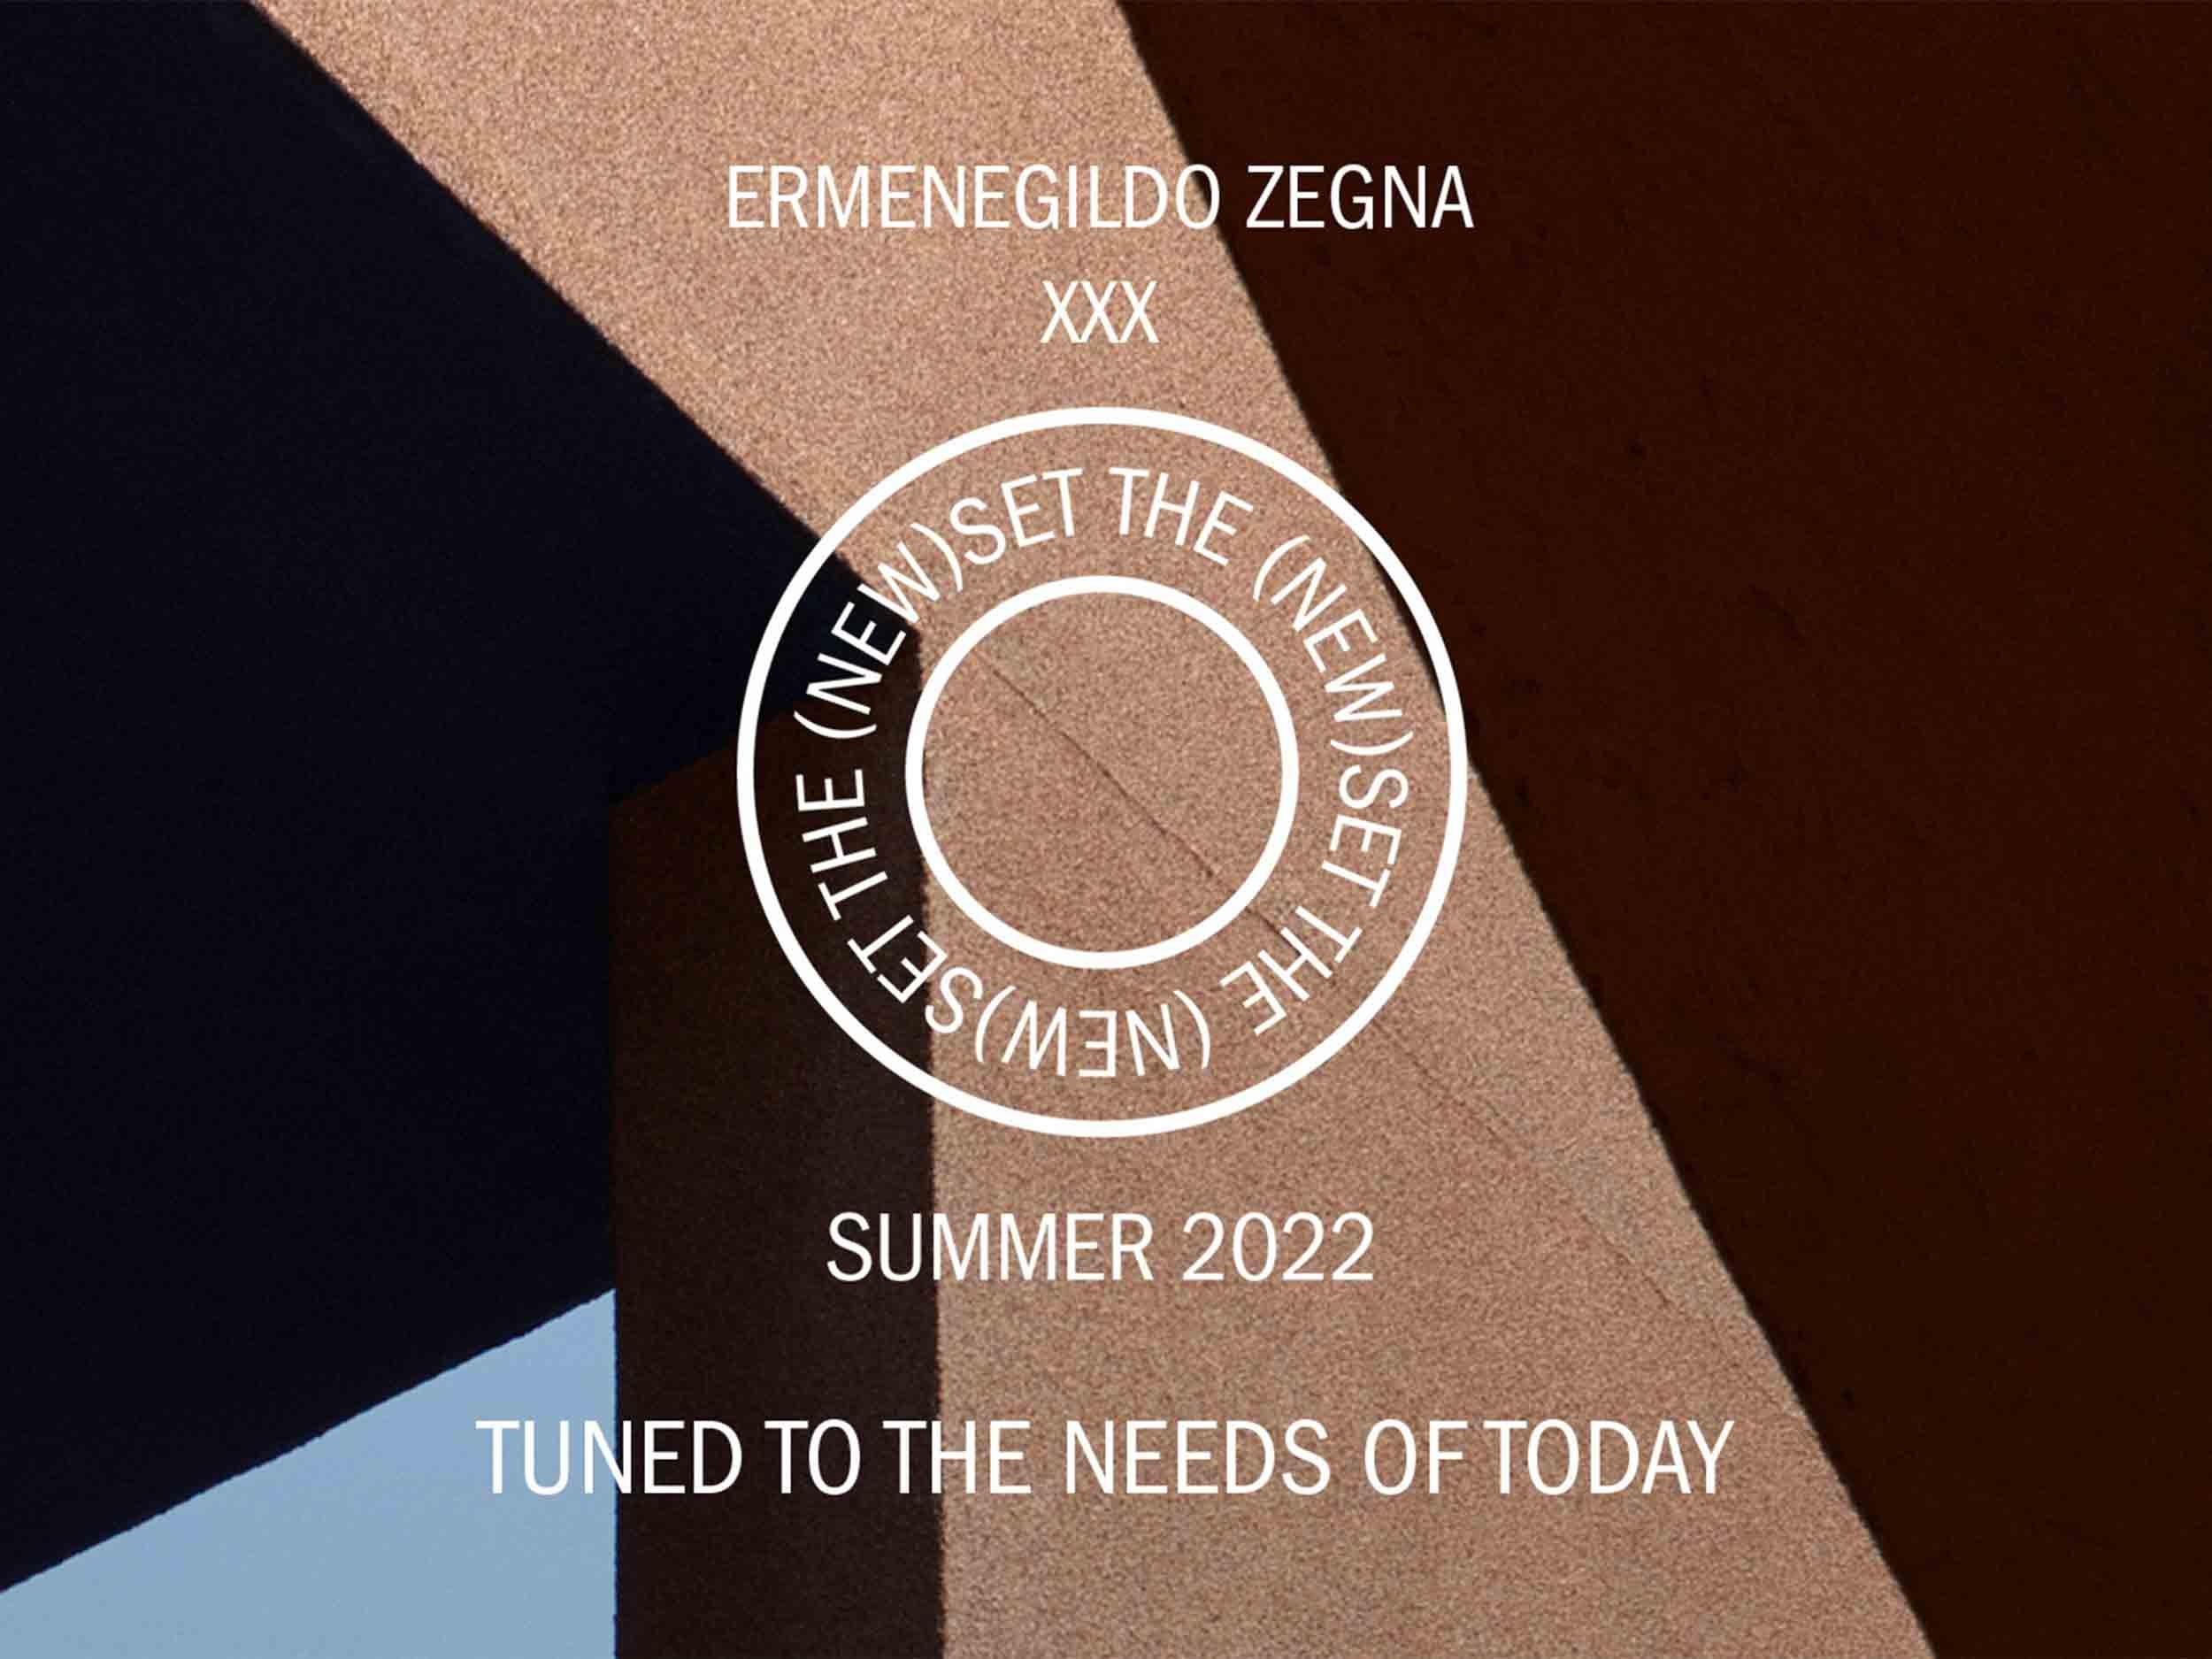 Livestream Ermenegildo Zegna XXX Spring/Summer 2022 collection here